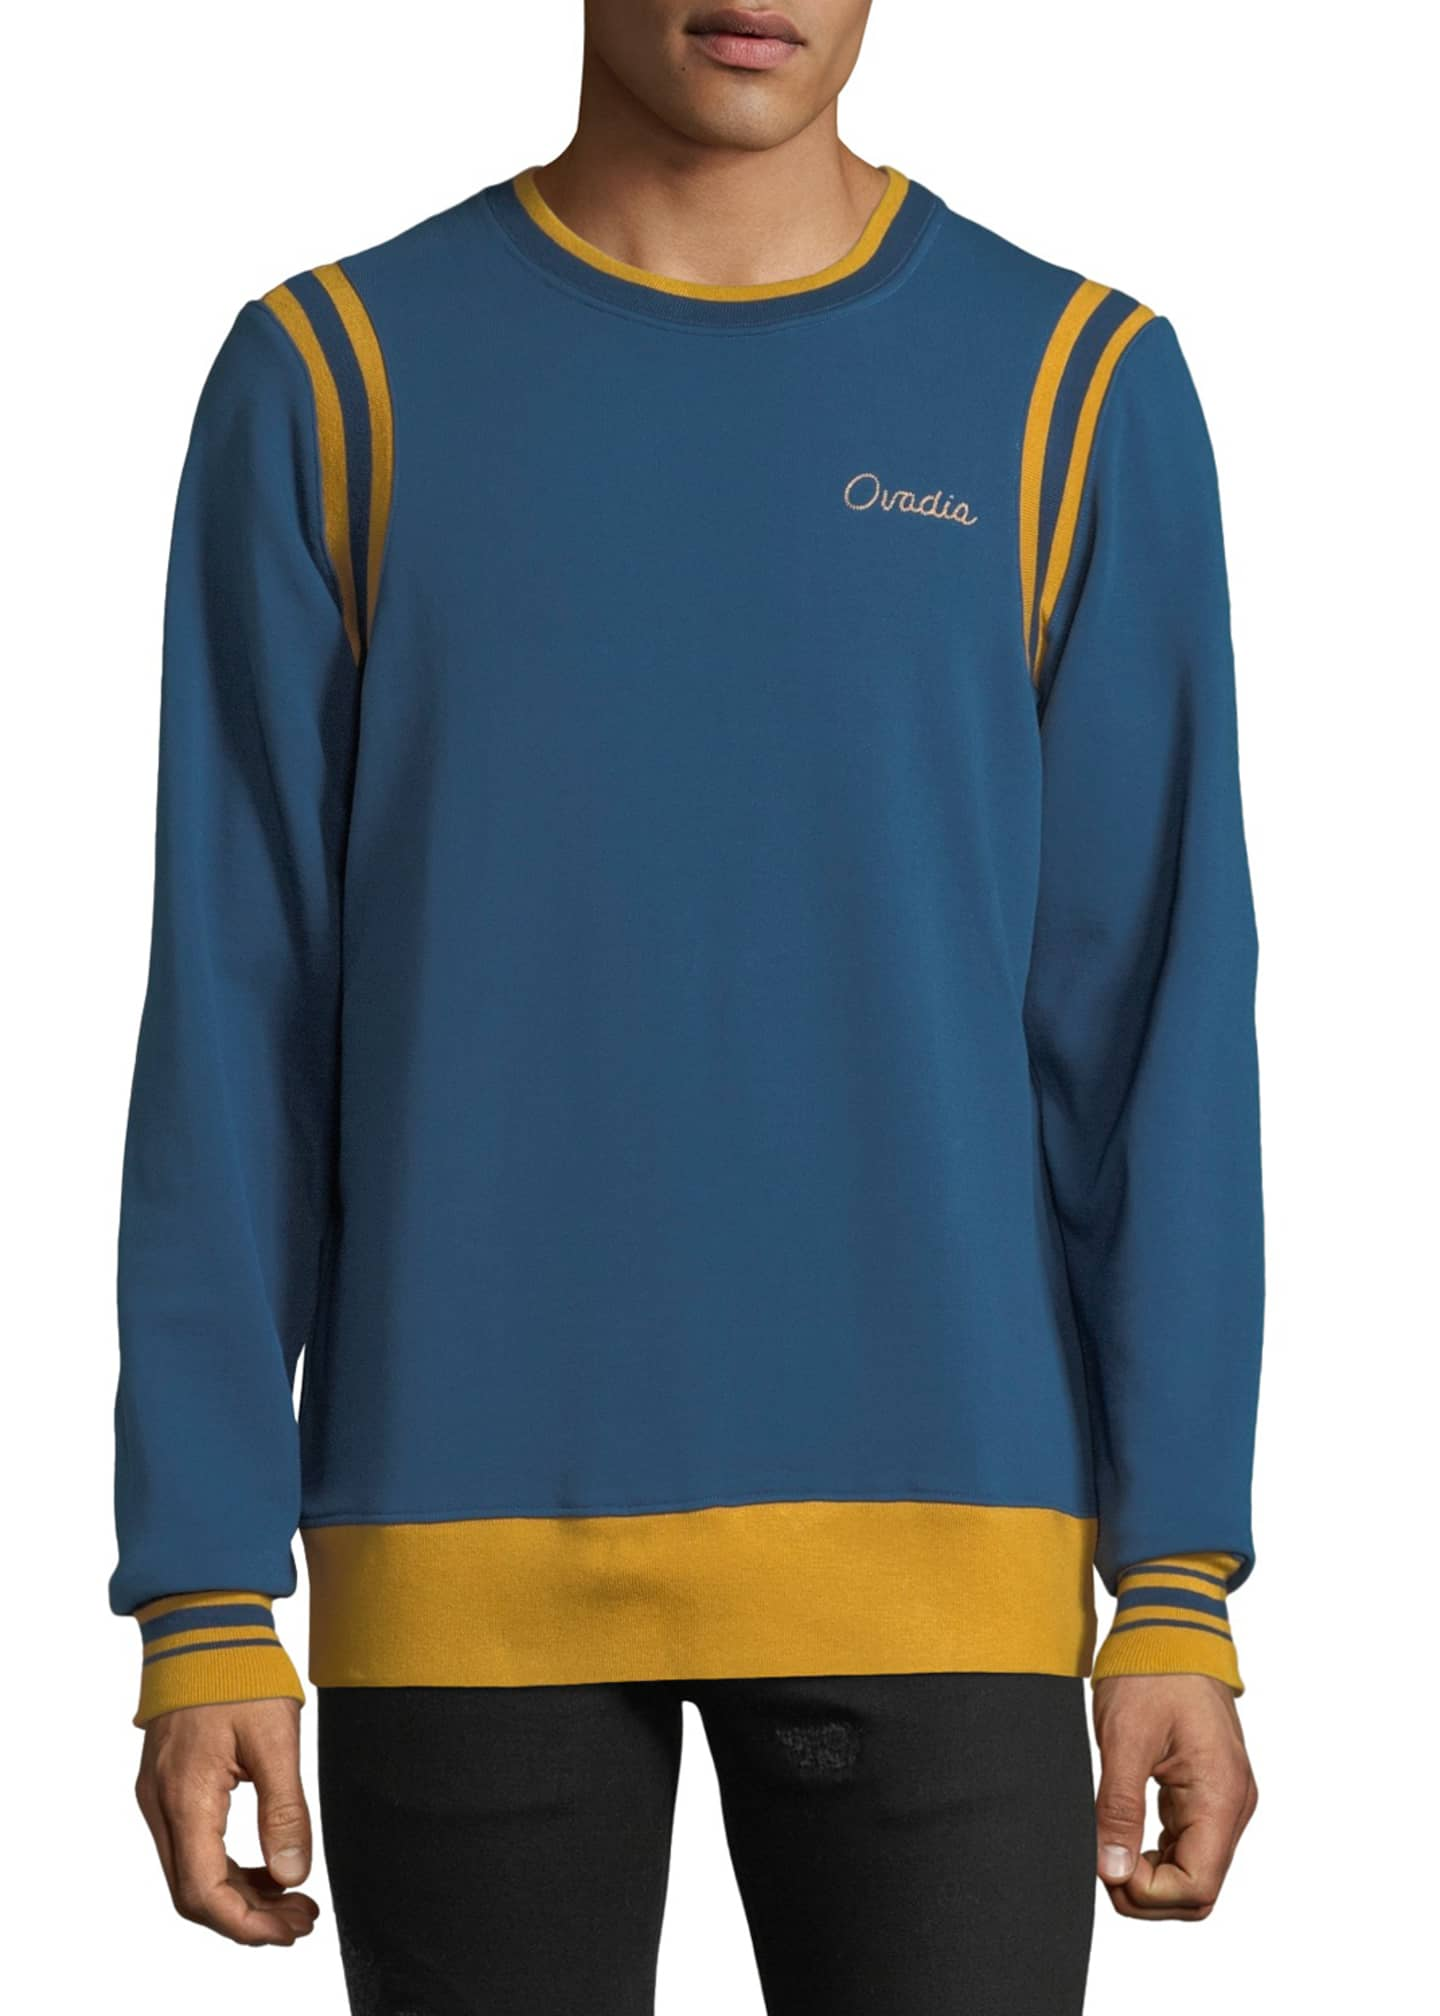 Ovadia & Sons Men's Striped-Trim Varsity Sweatshirt